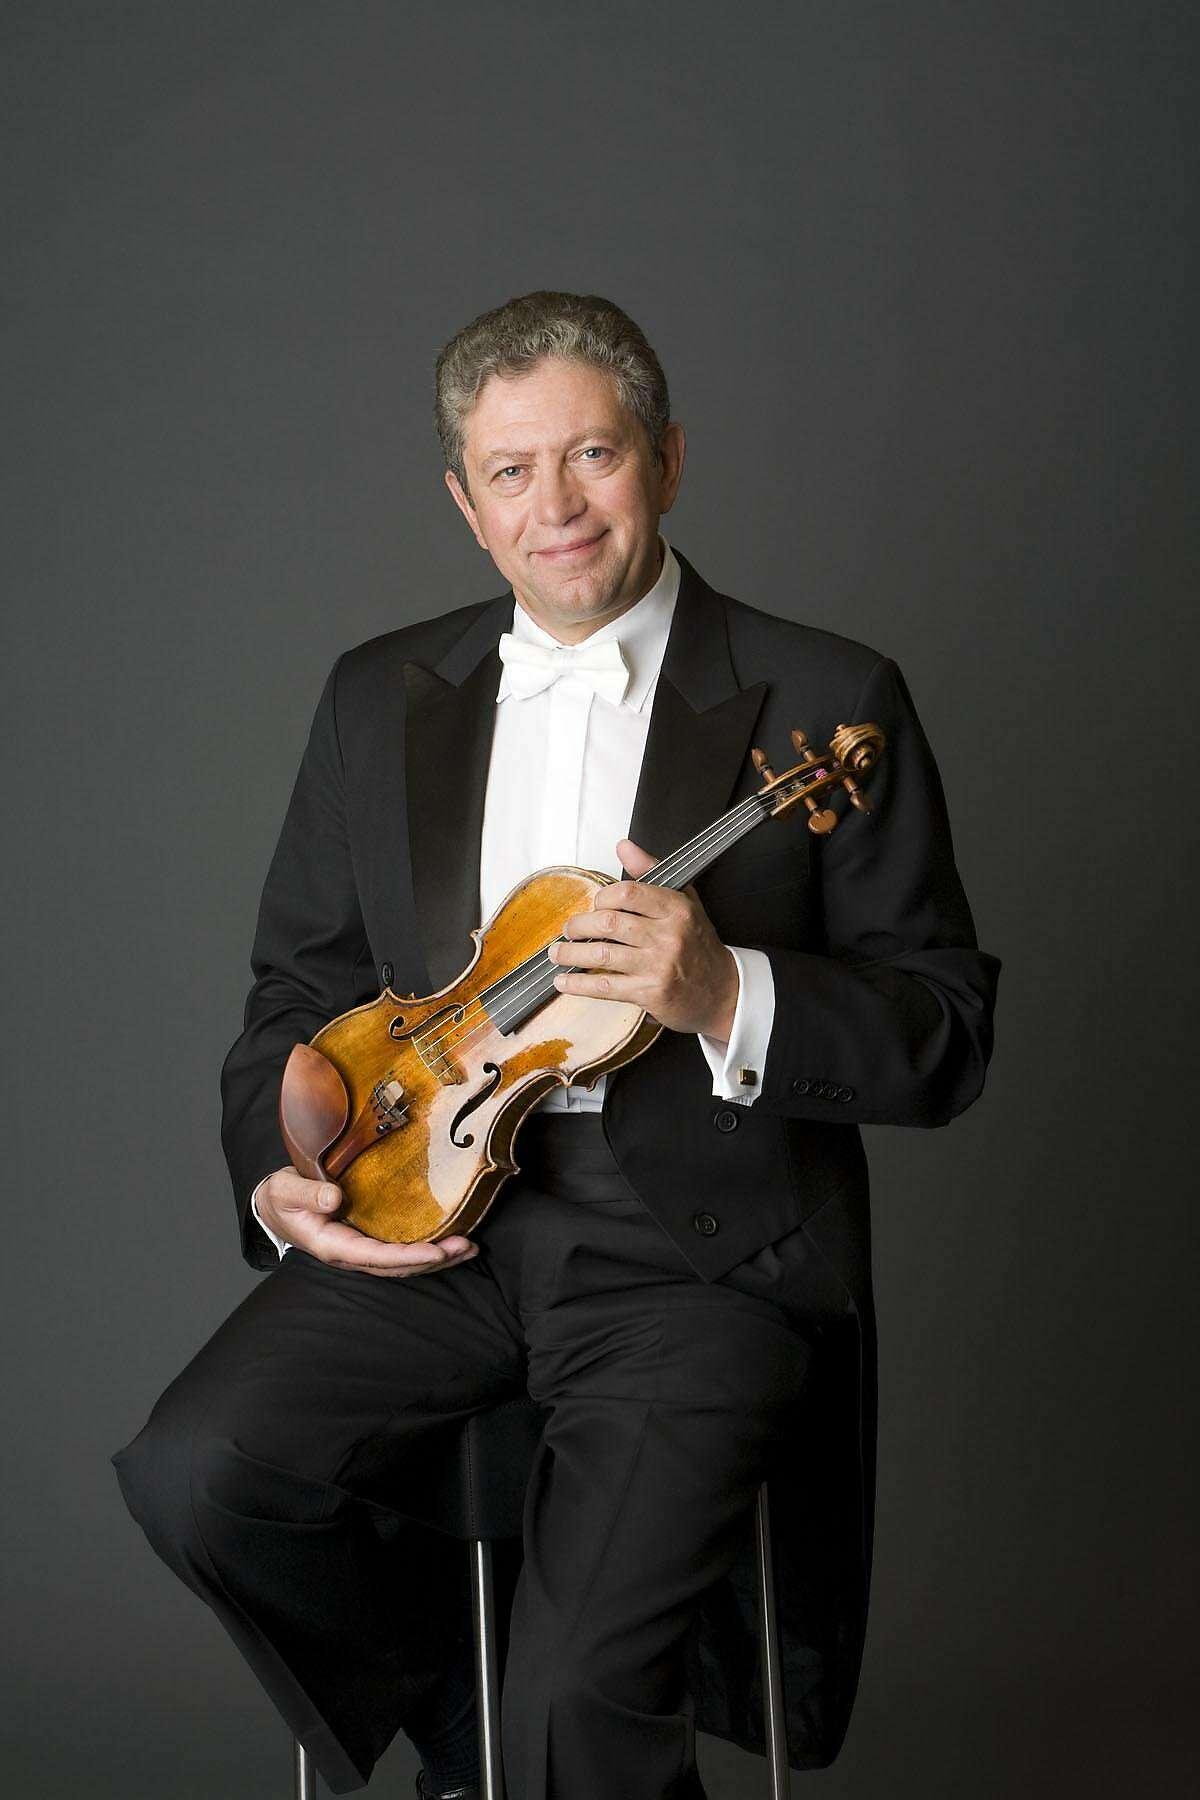 Violinist Alexander Barantschik